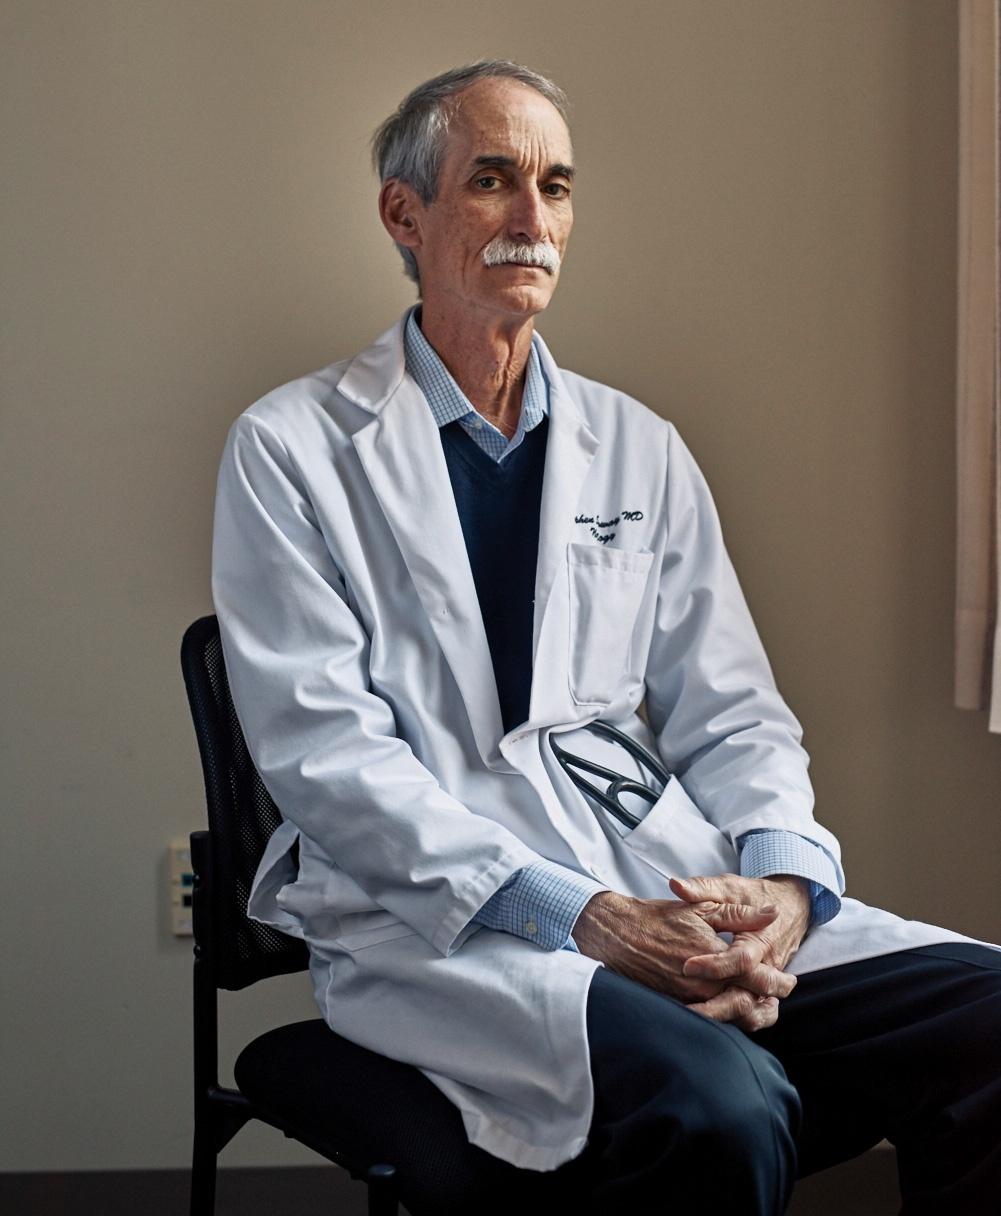 Photograph of Professor Stephen Salloway sitting, wearing a lab coat.